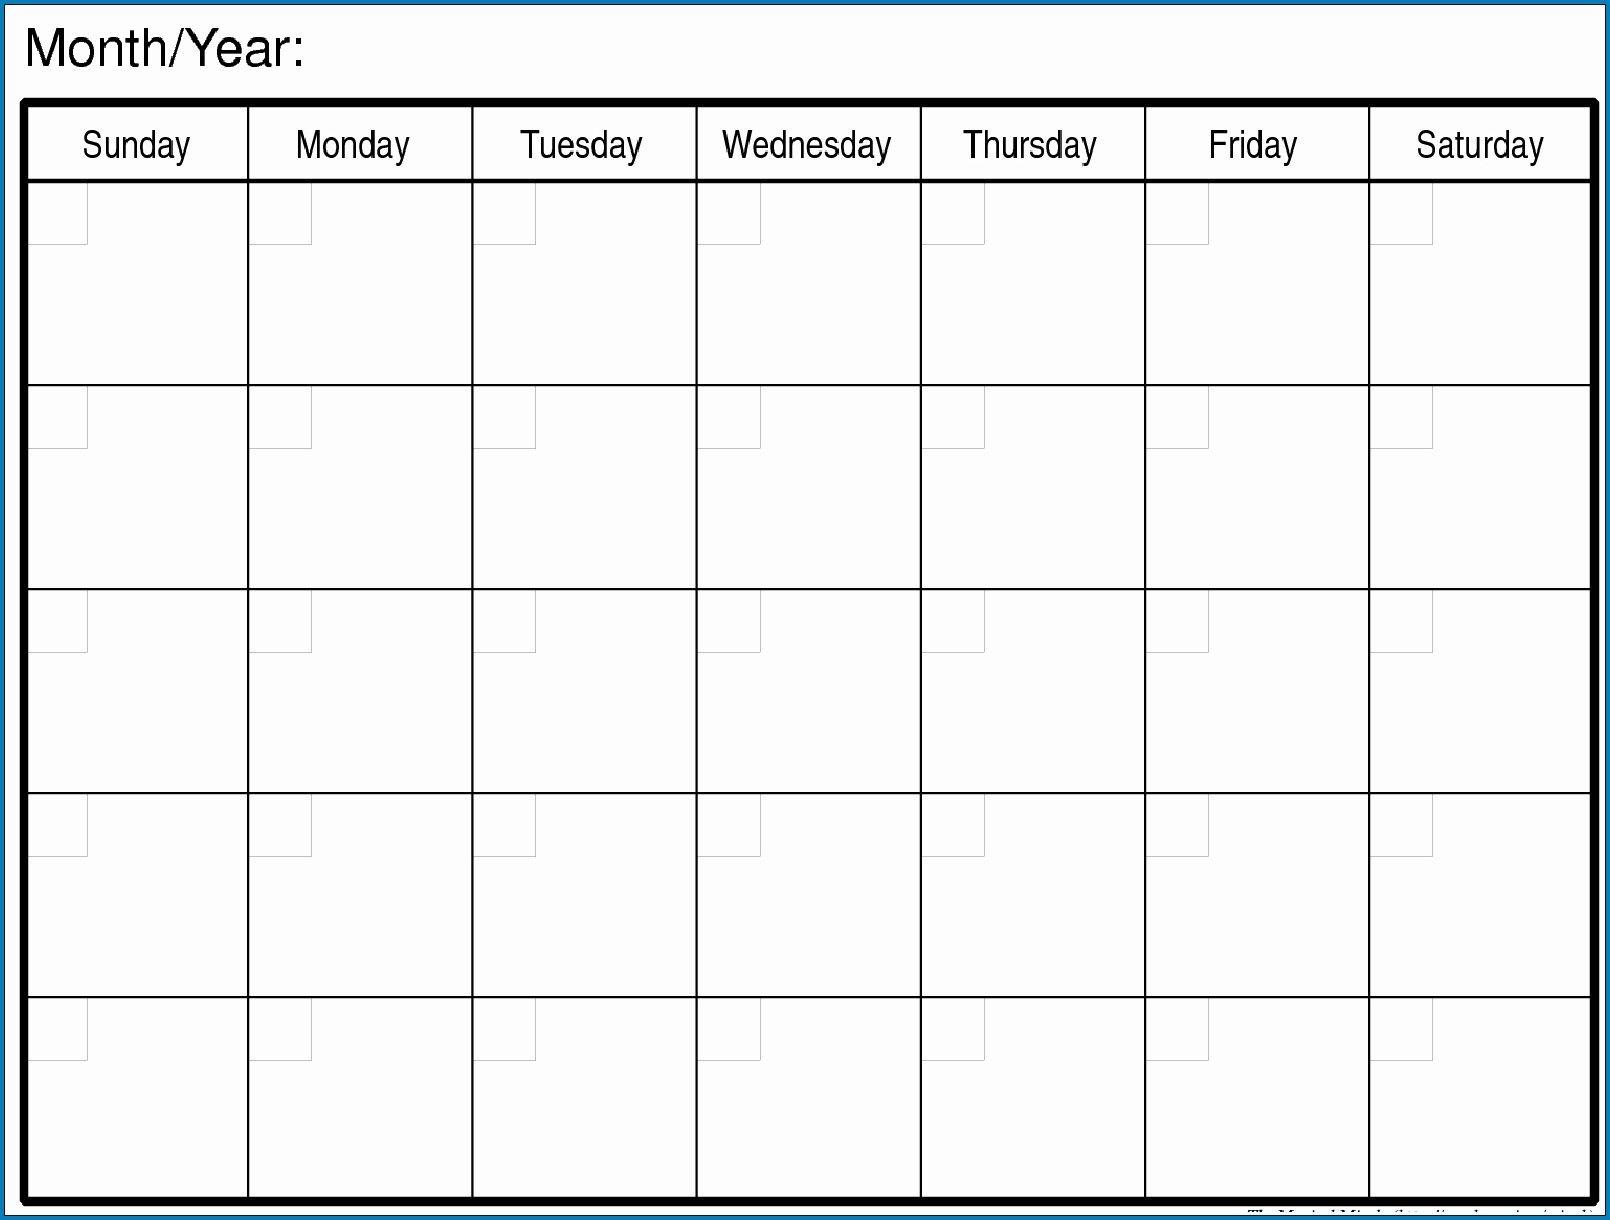 Free Blank Monday Through Friday Month Calendar Template pertaining to Printable Monday Through Friday Calendar